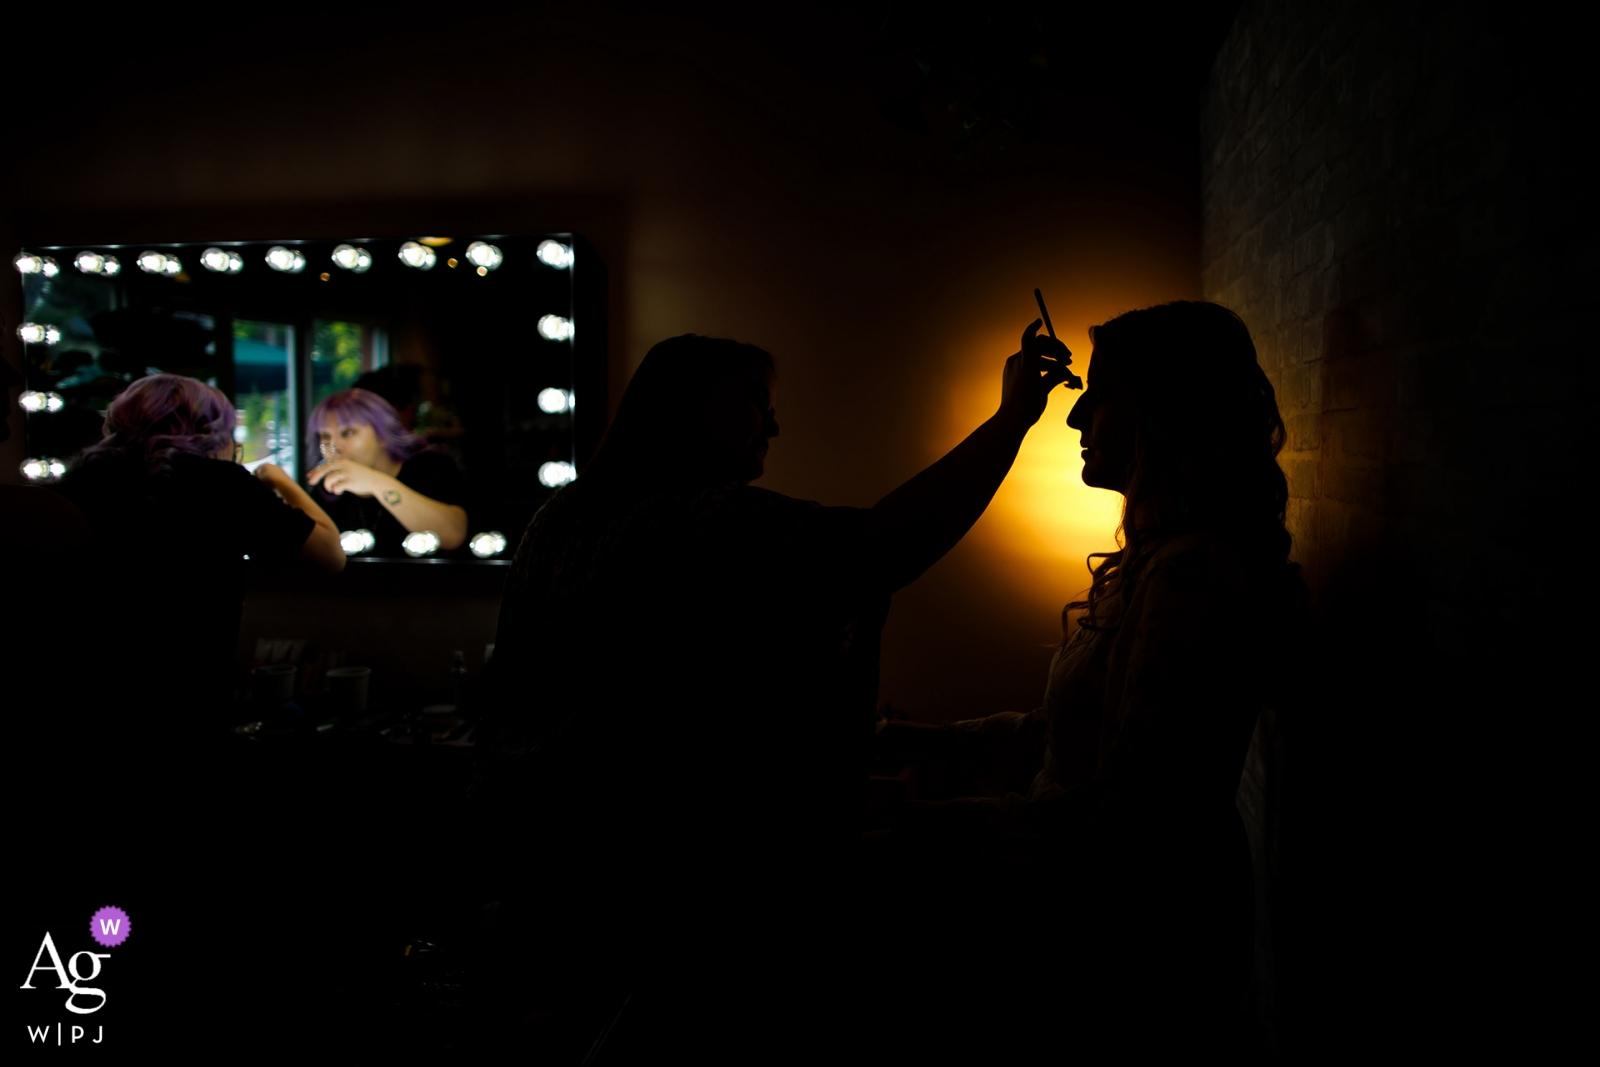 Justin Edmonds is an artistic wedding photographer for Colorado